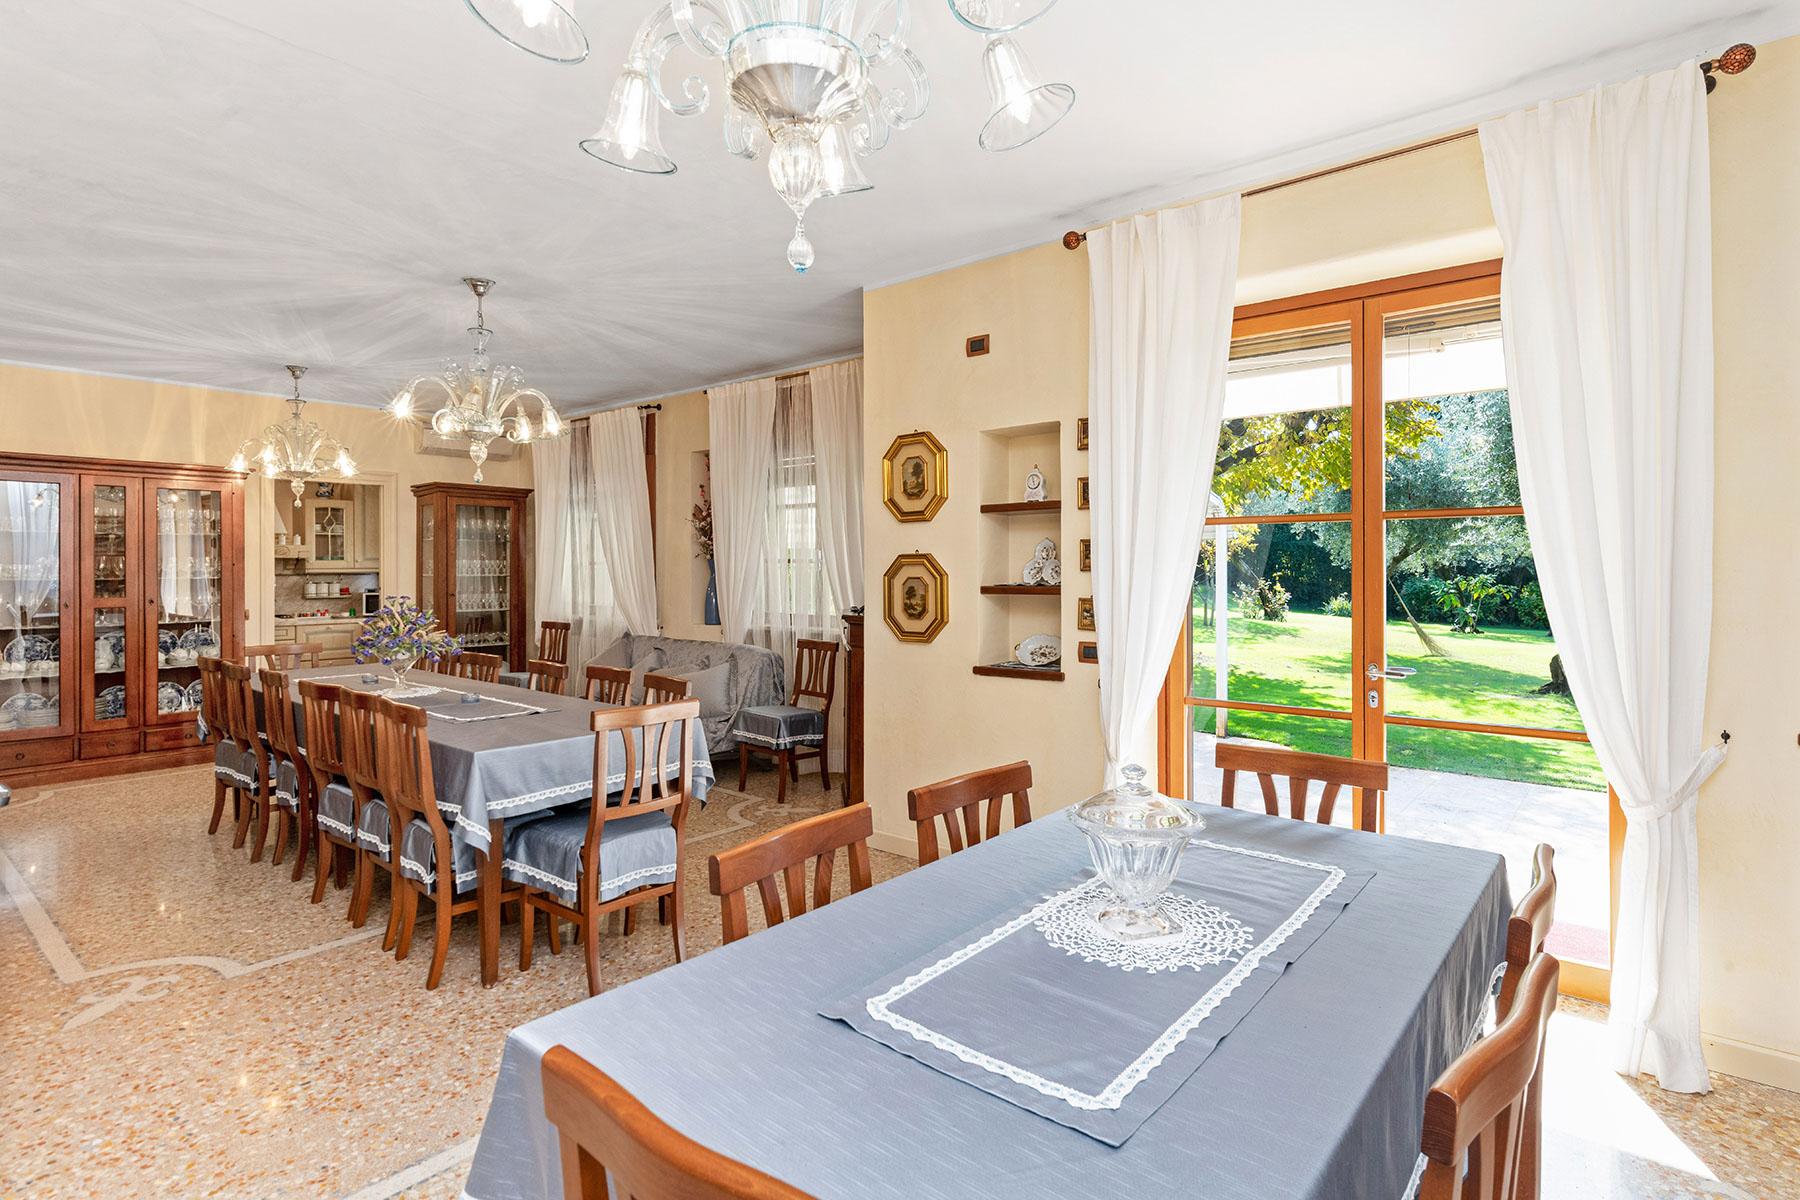 Villa in Vendita a Sirmione: 5 locali, 500 mq - Foto 12